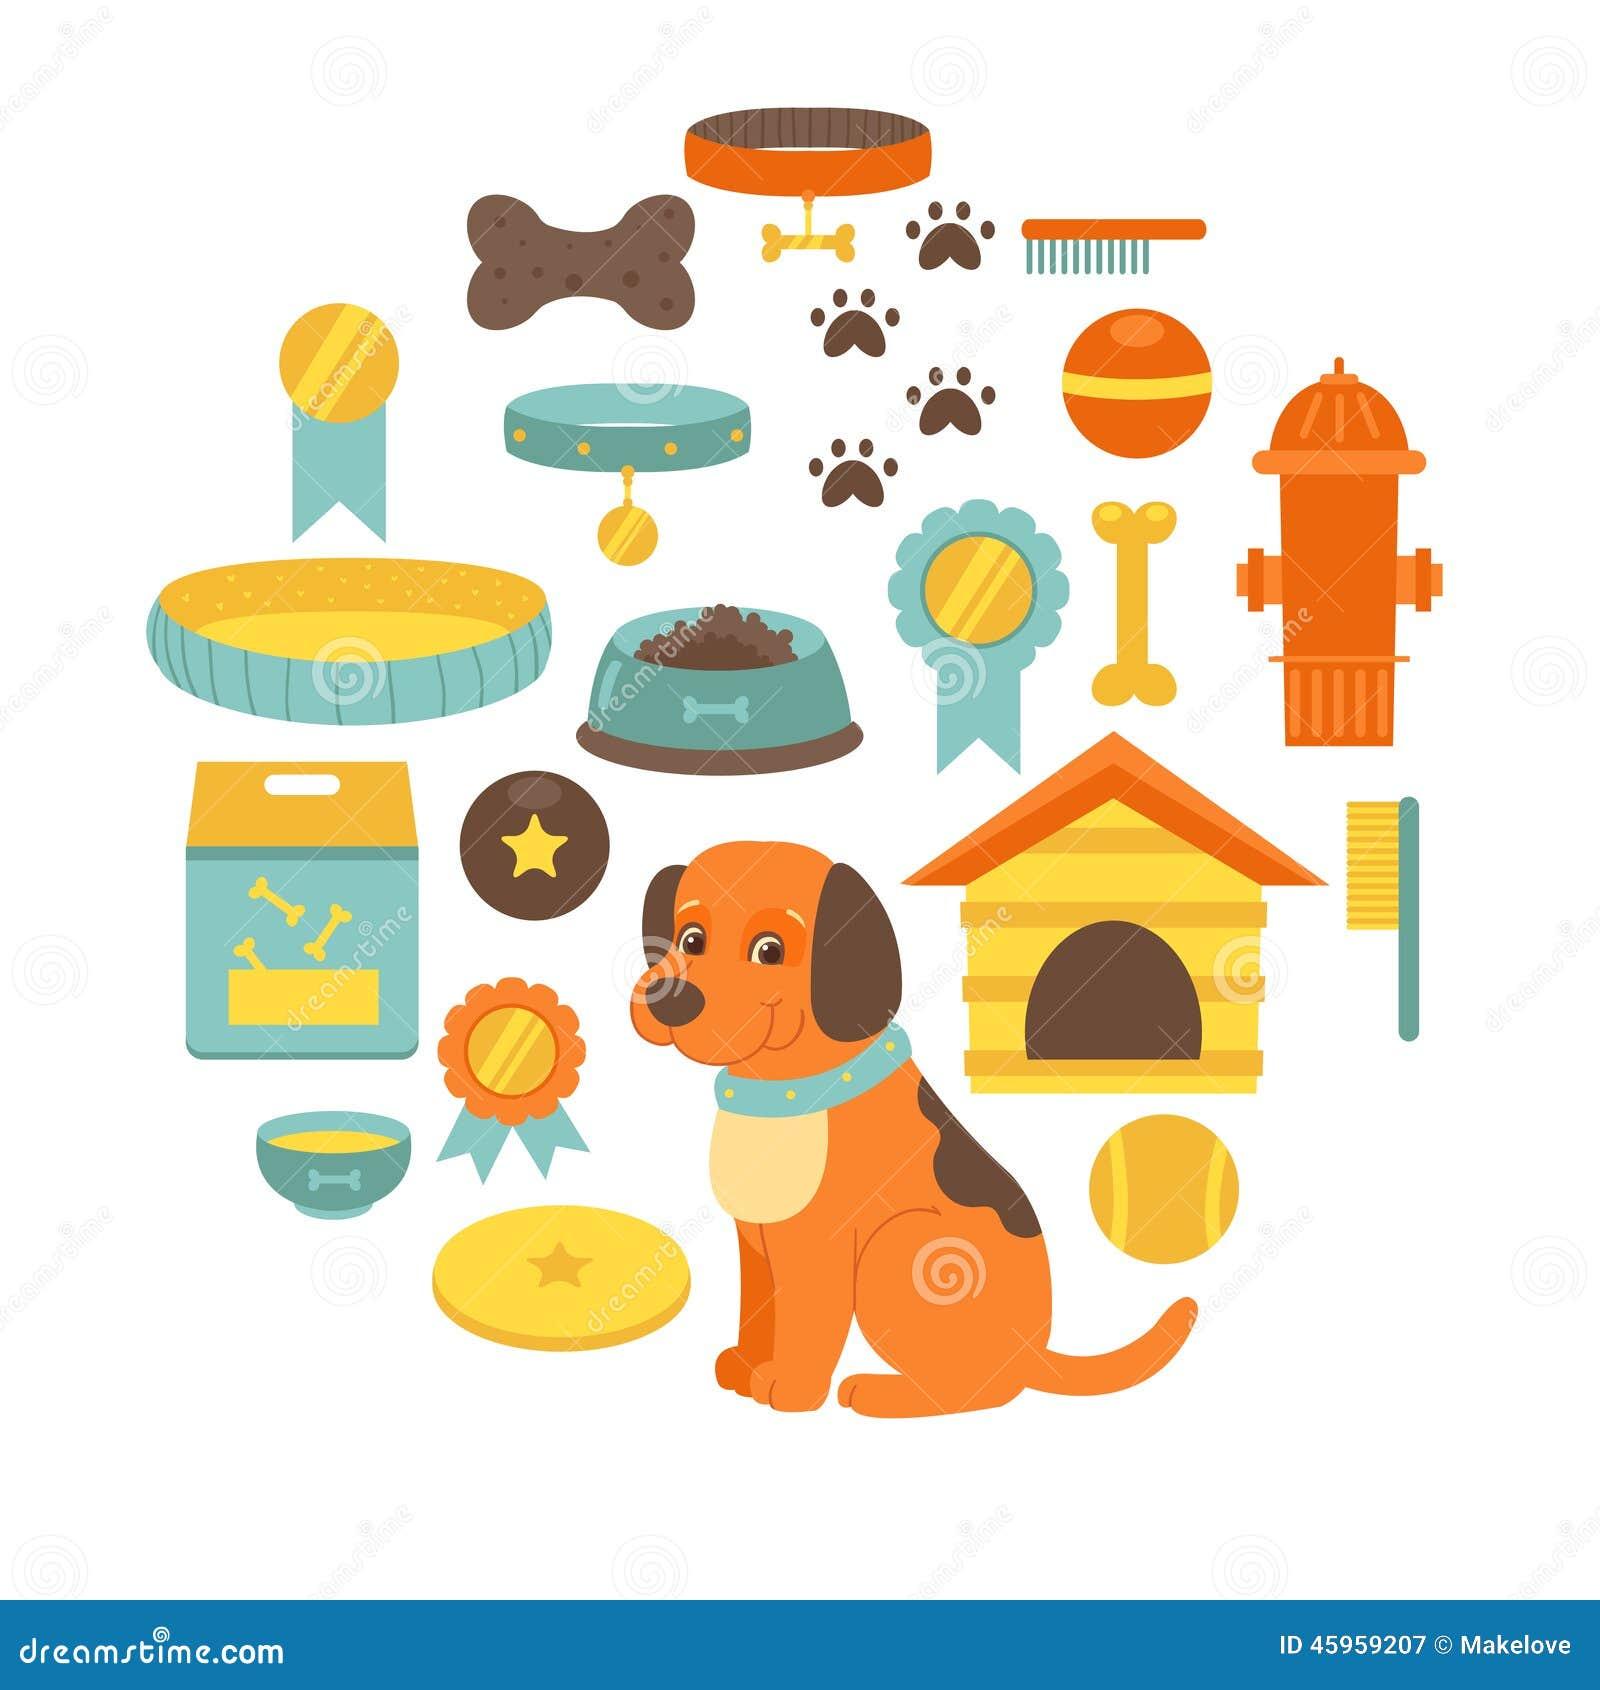 Stuff Food Toy Dog